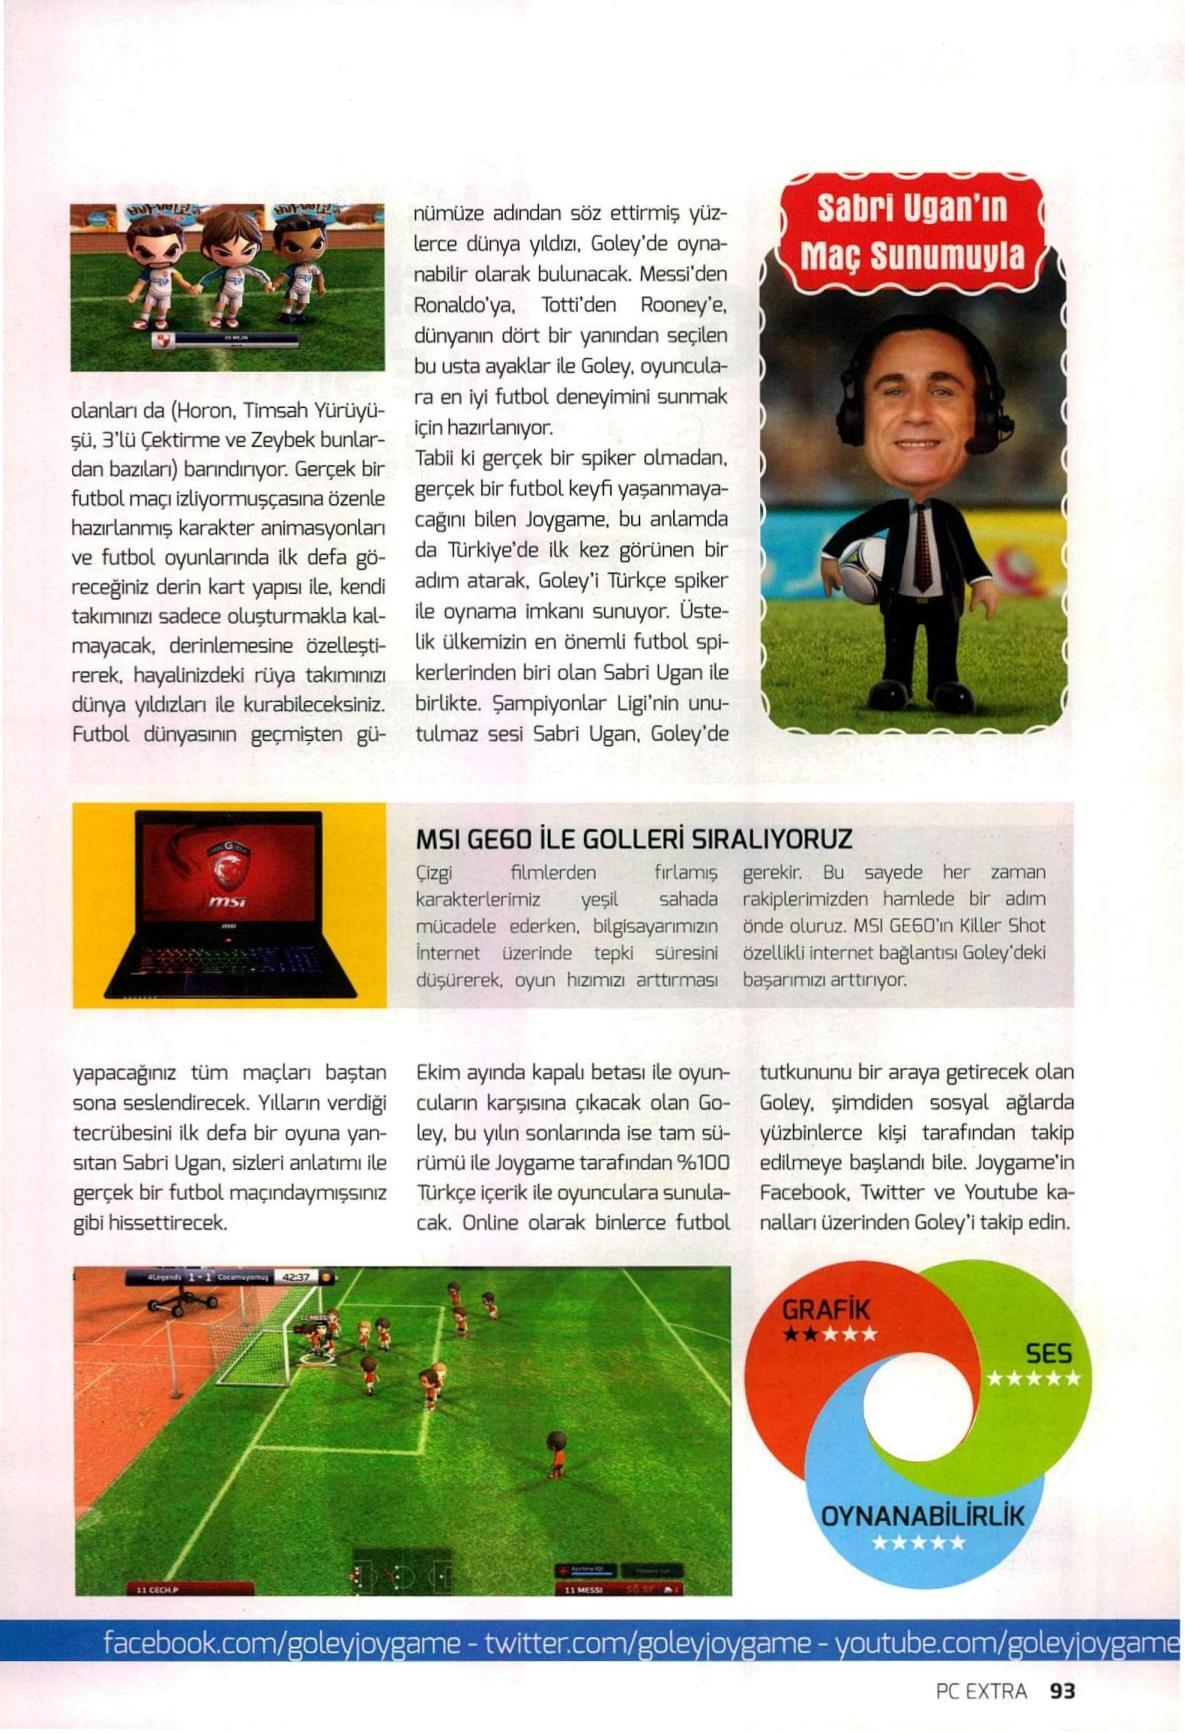 Netmarble-Turkey-PC-Extra-Sayfa-93-01.12.14